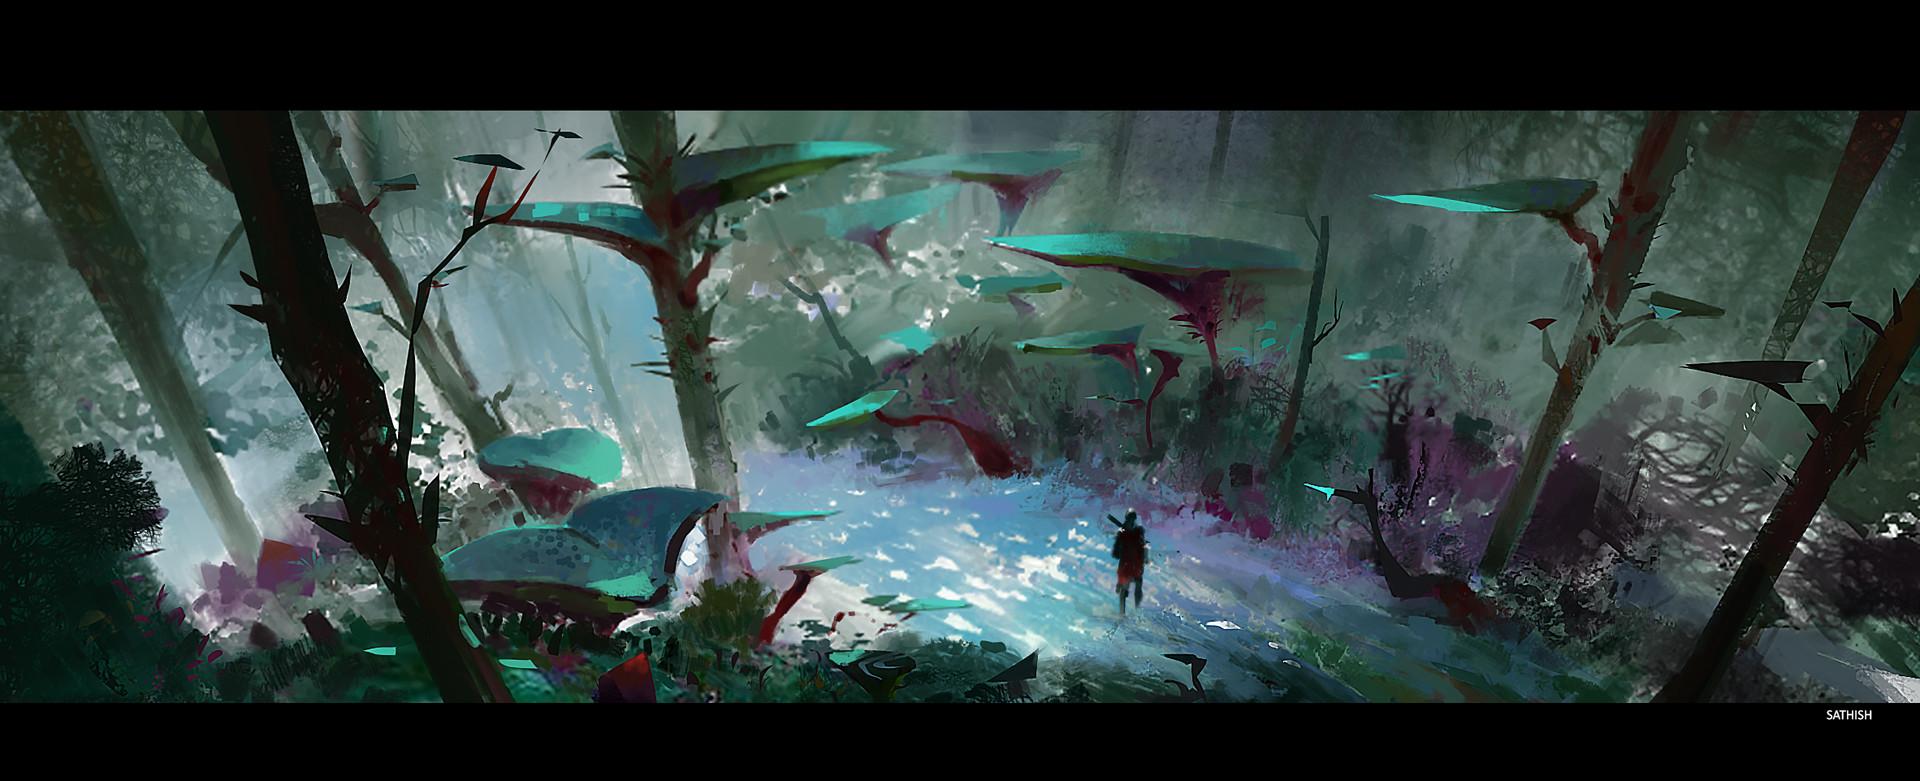 Environment design sketch 02